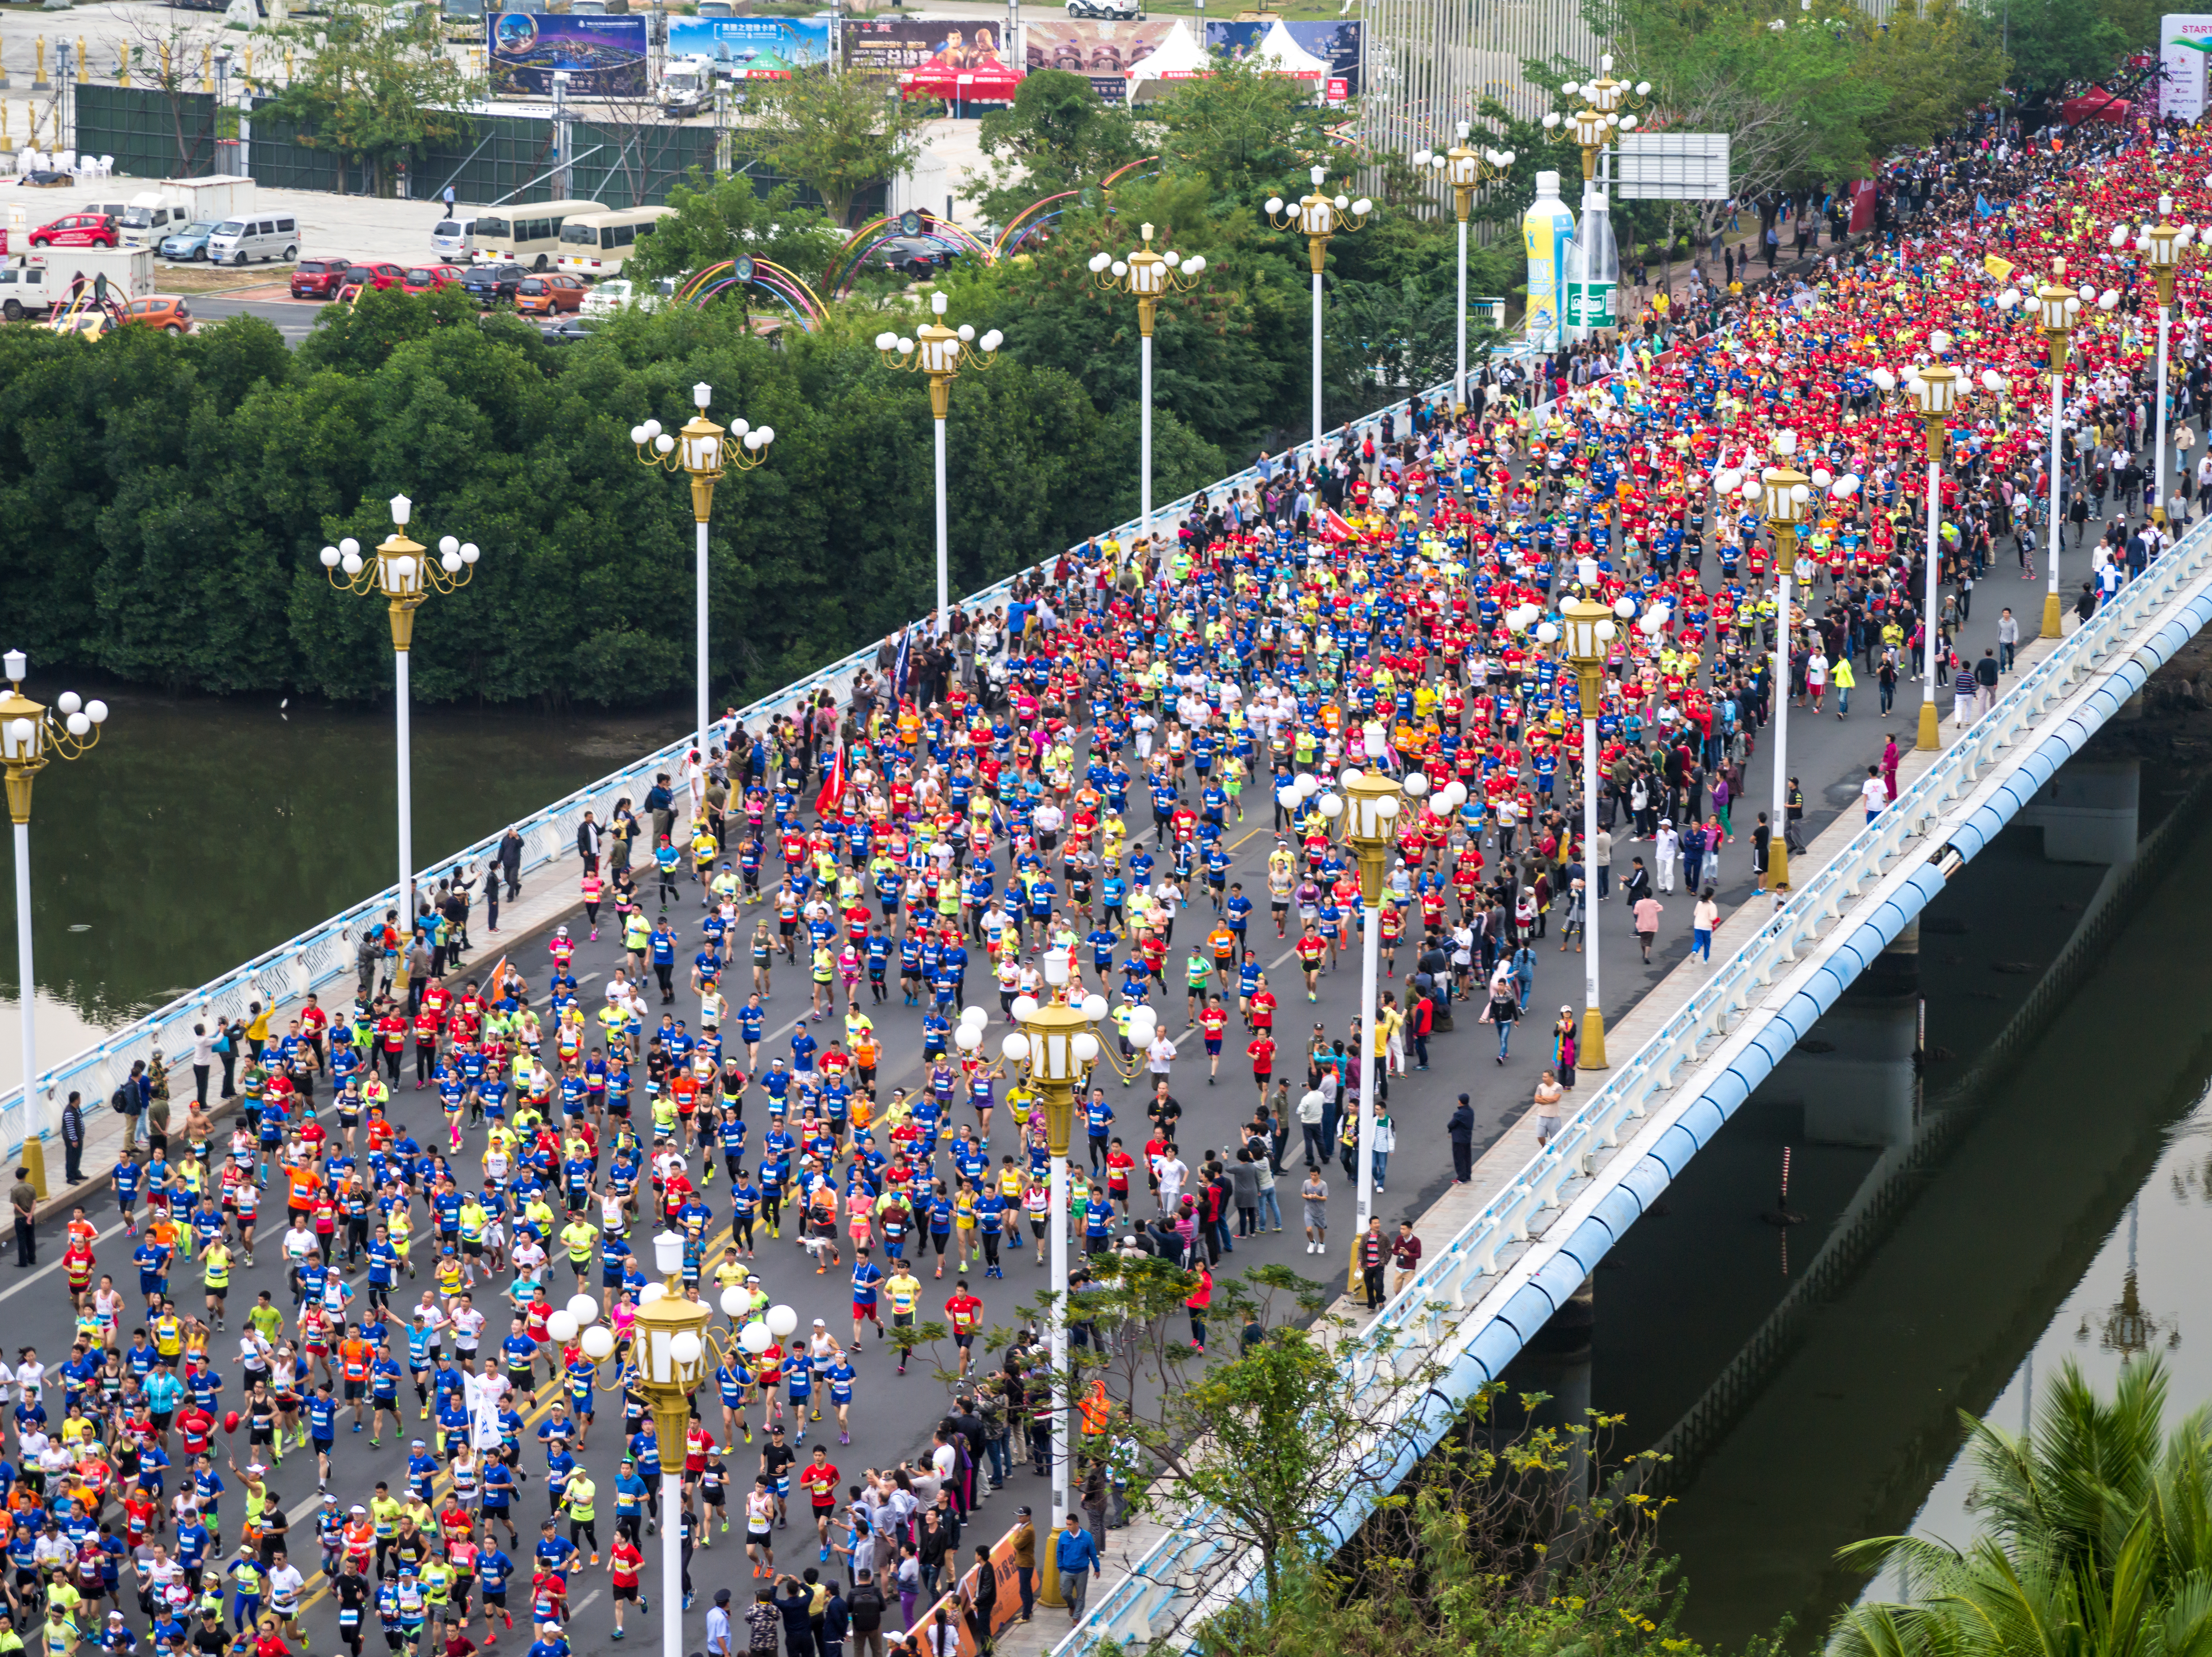 Participants run during the 2016 Hainan International Marathon on February 28, 2016 in Sanya, Hainan Province of China.